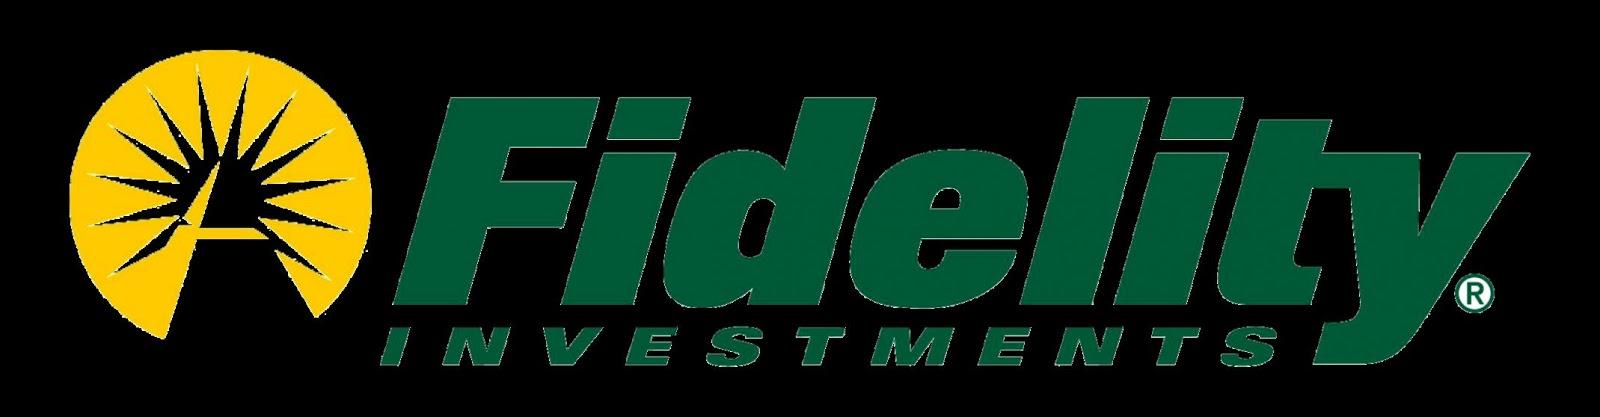 Fidelity Investment Logo.